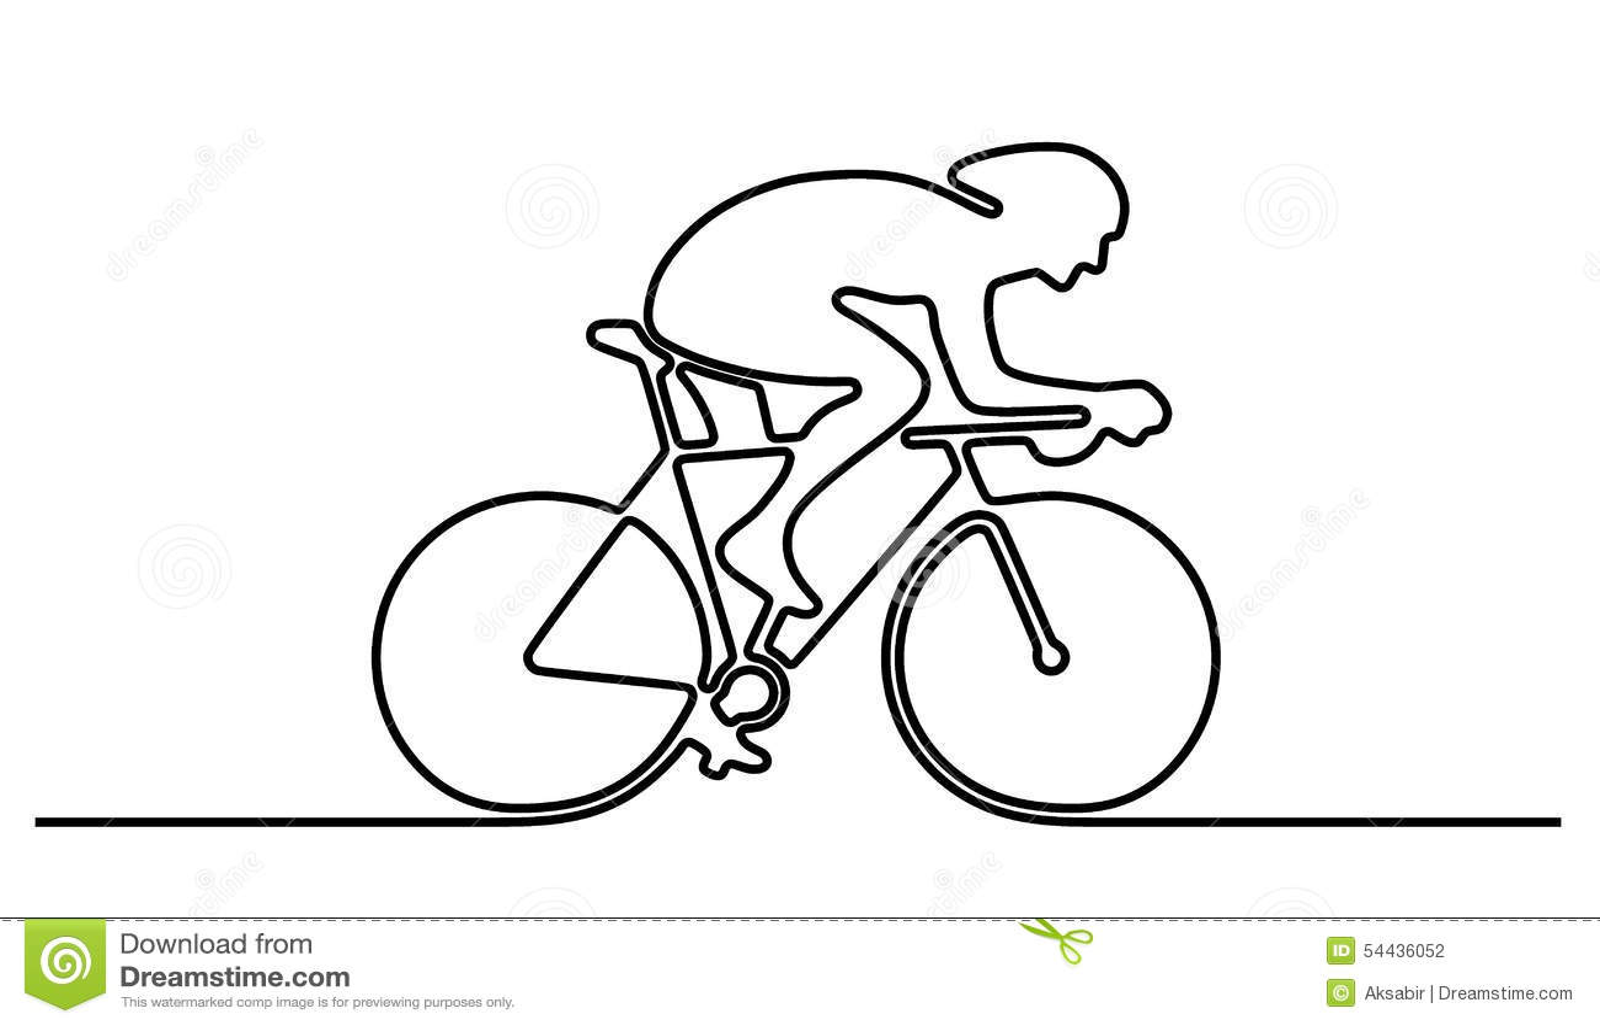 Bike Frame Design Template